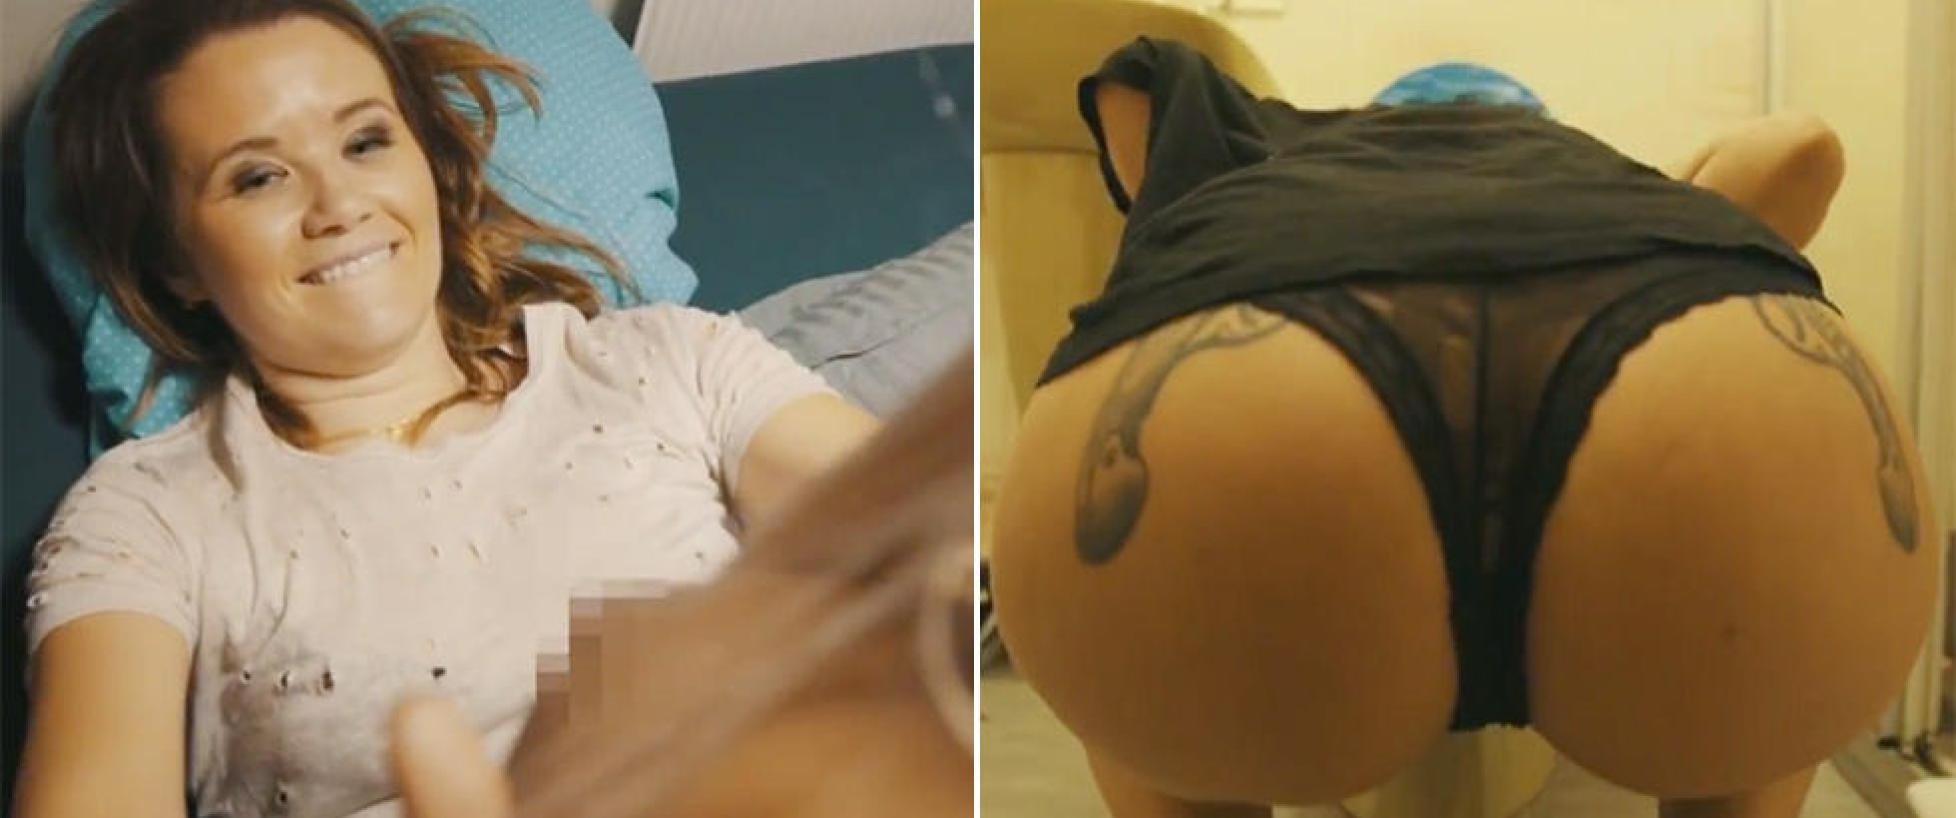 penest nakenbilder mature porno